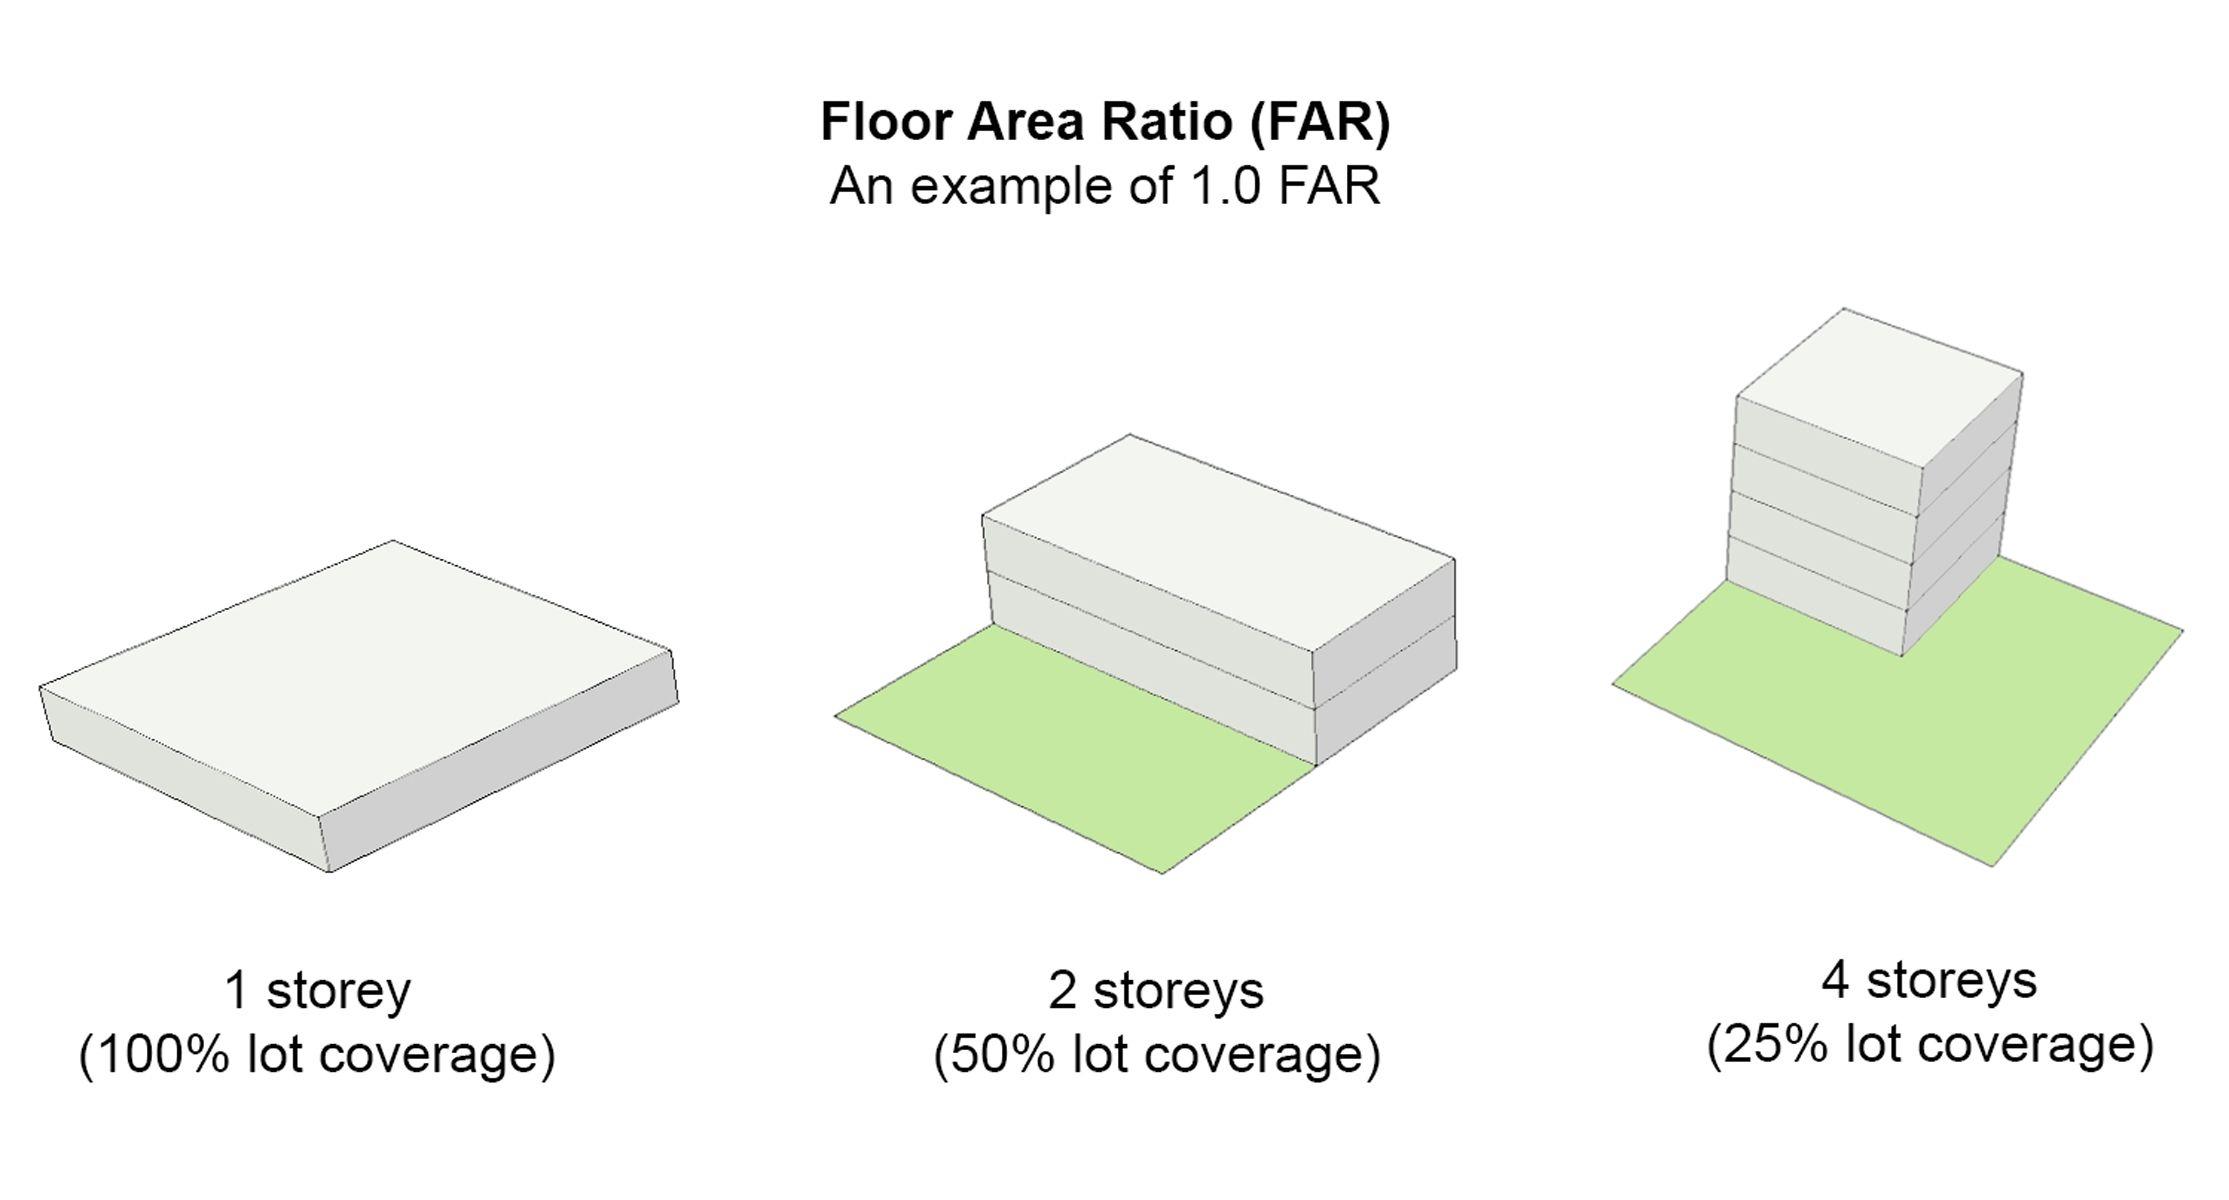 Floor Area Ratio Calculator Nyc New Blog Wallpapers Floor Area Ratio Blog Wallpaper Flooring